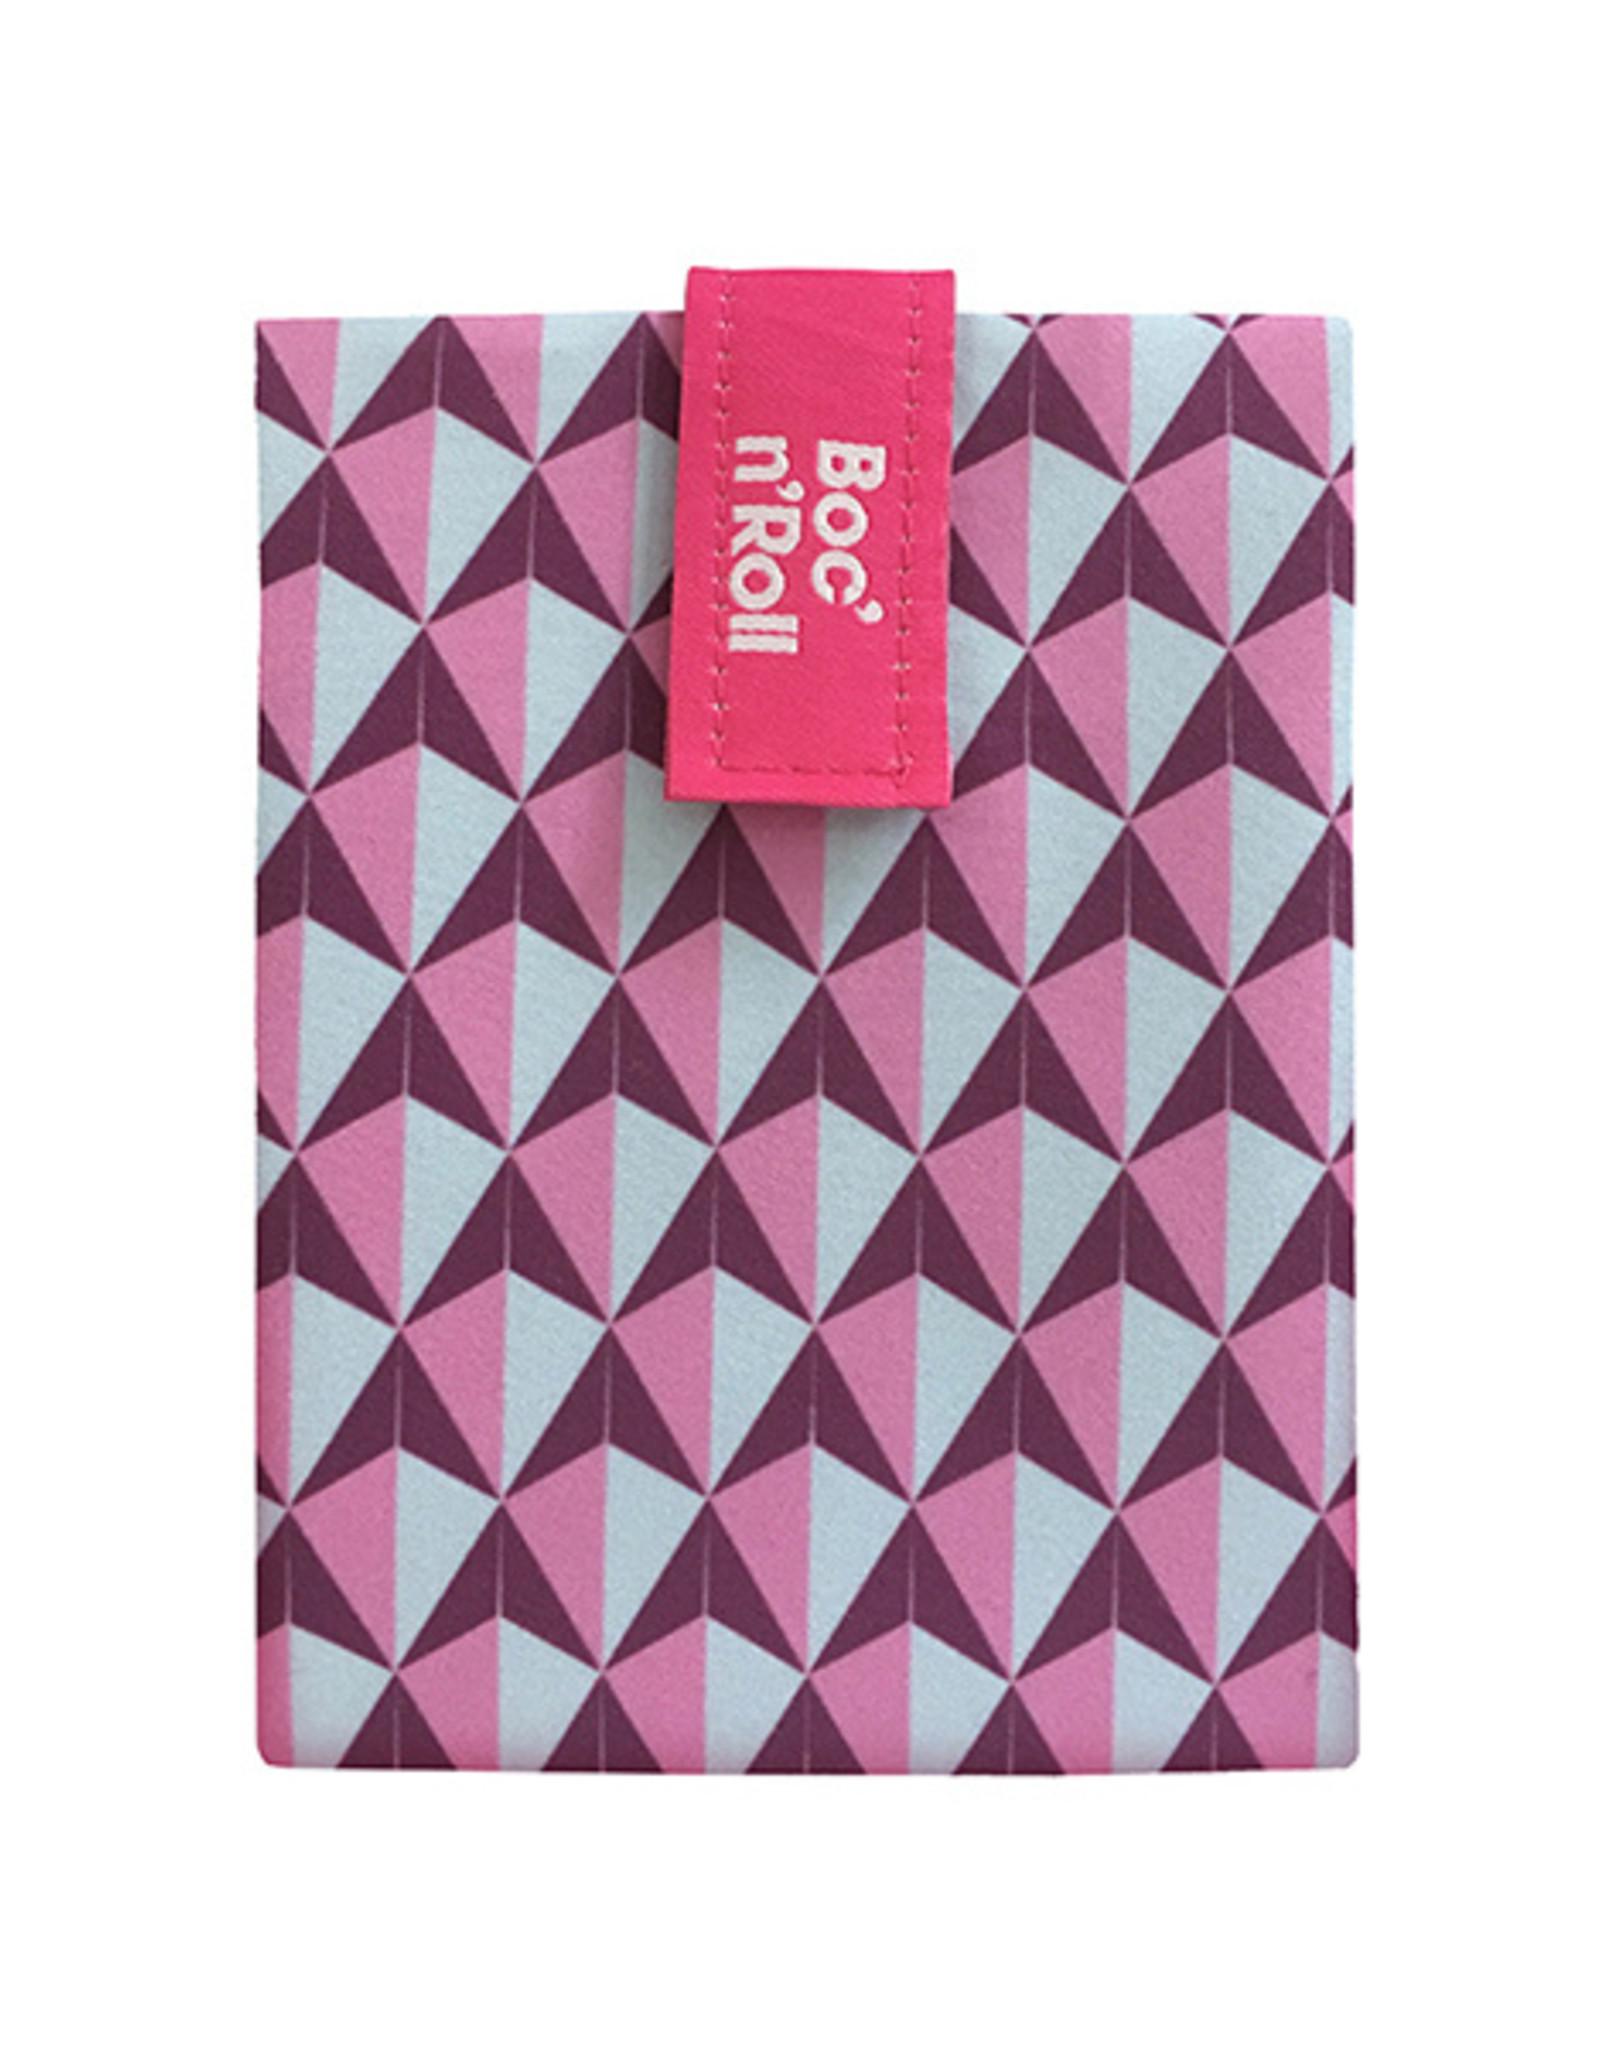 Roll'Eat Boc'n'Roll - Tiles pink